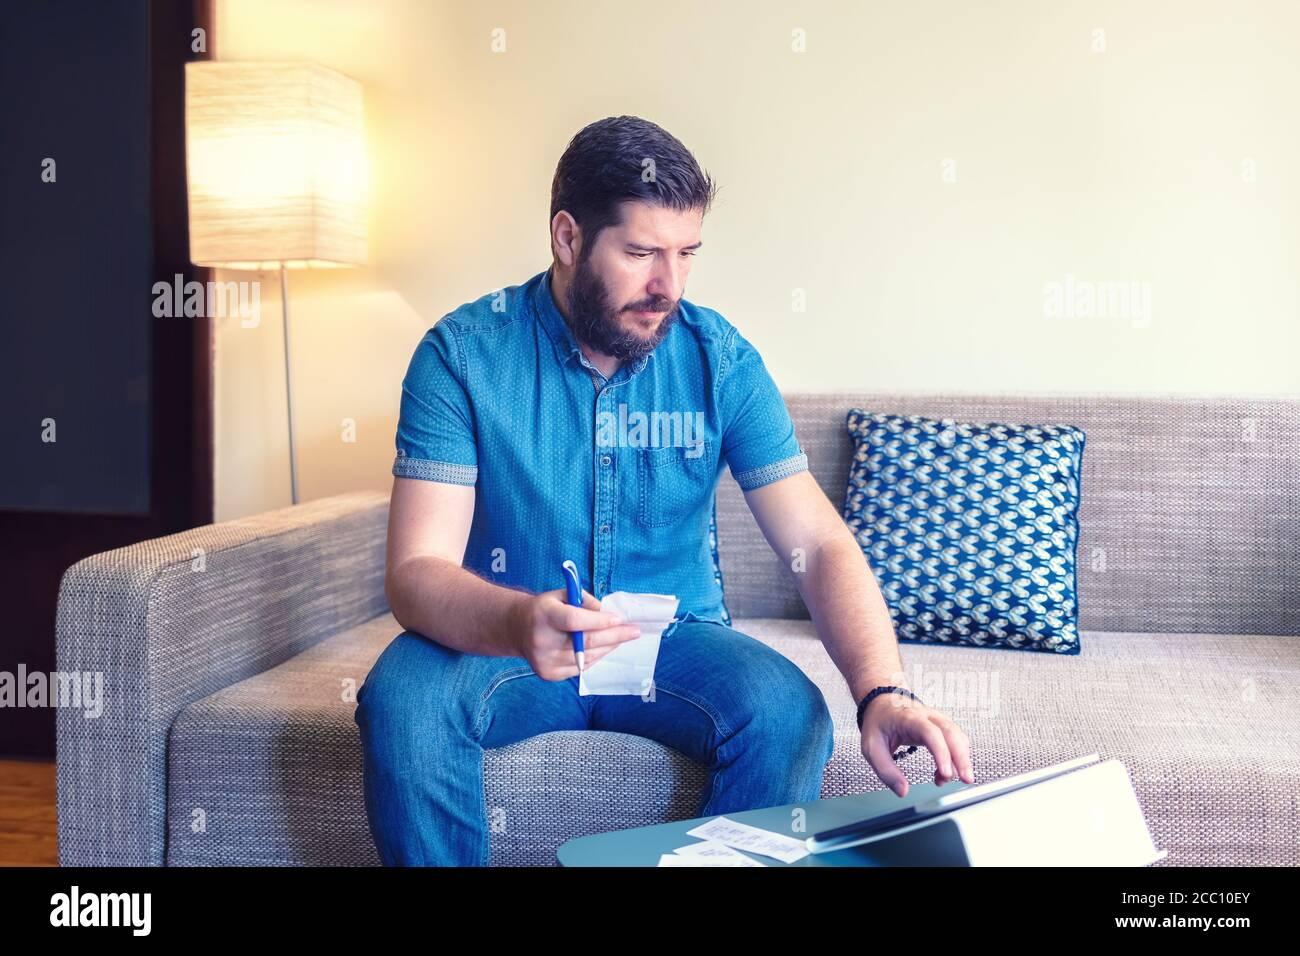 Mature man doing home finance online using digital tablet Stock Photo